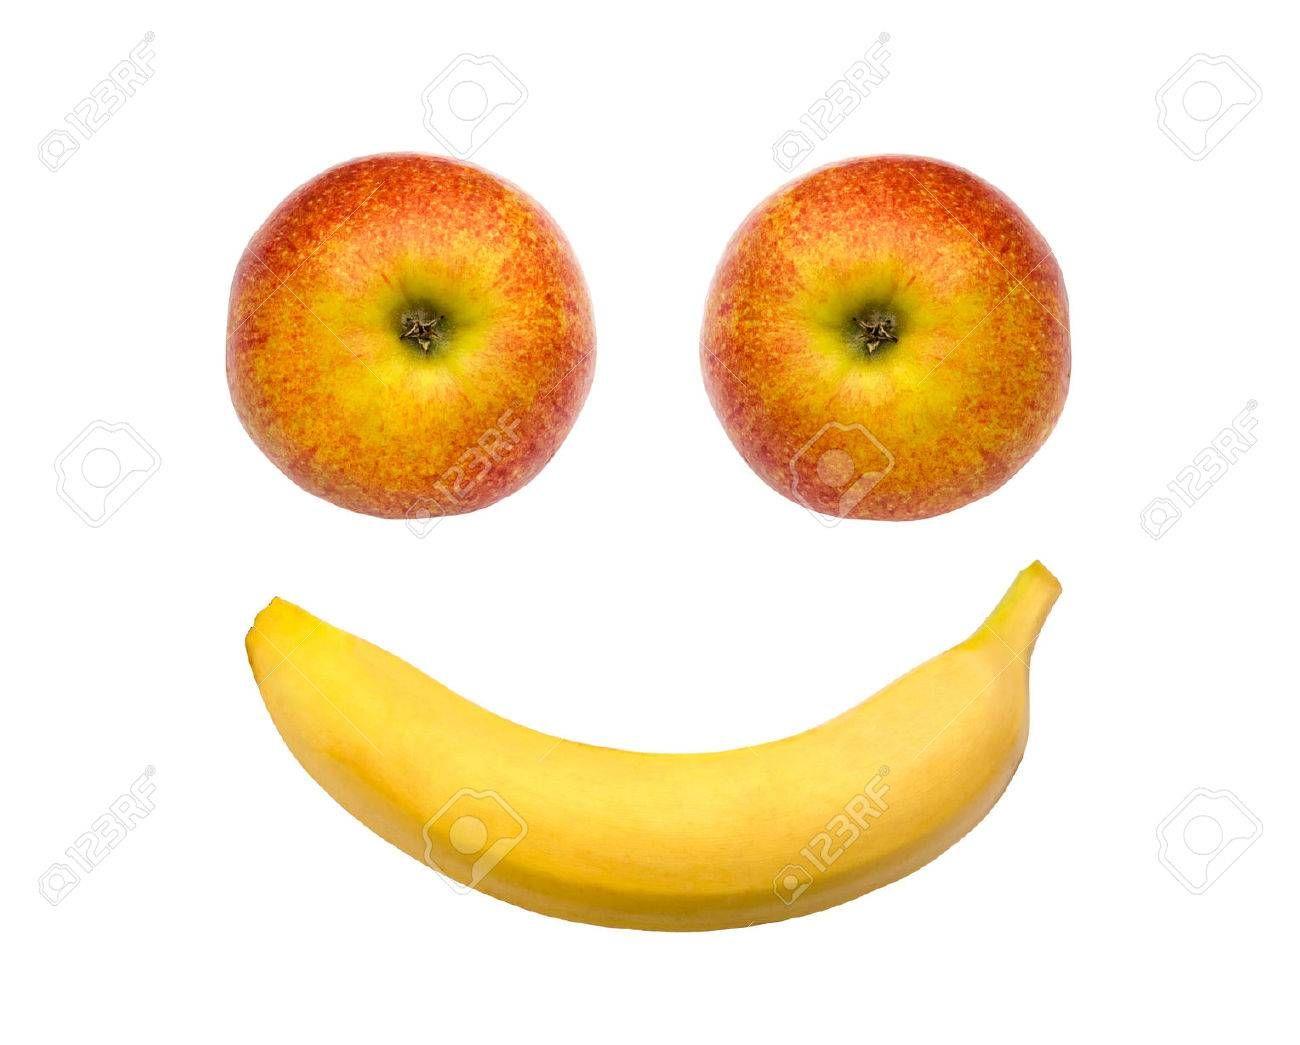 Äpfel und Fairtrade Bio-Bananen